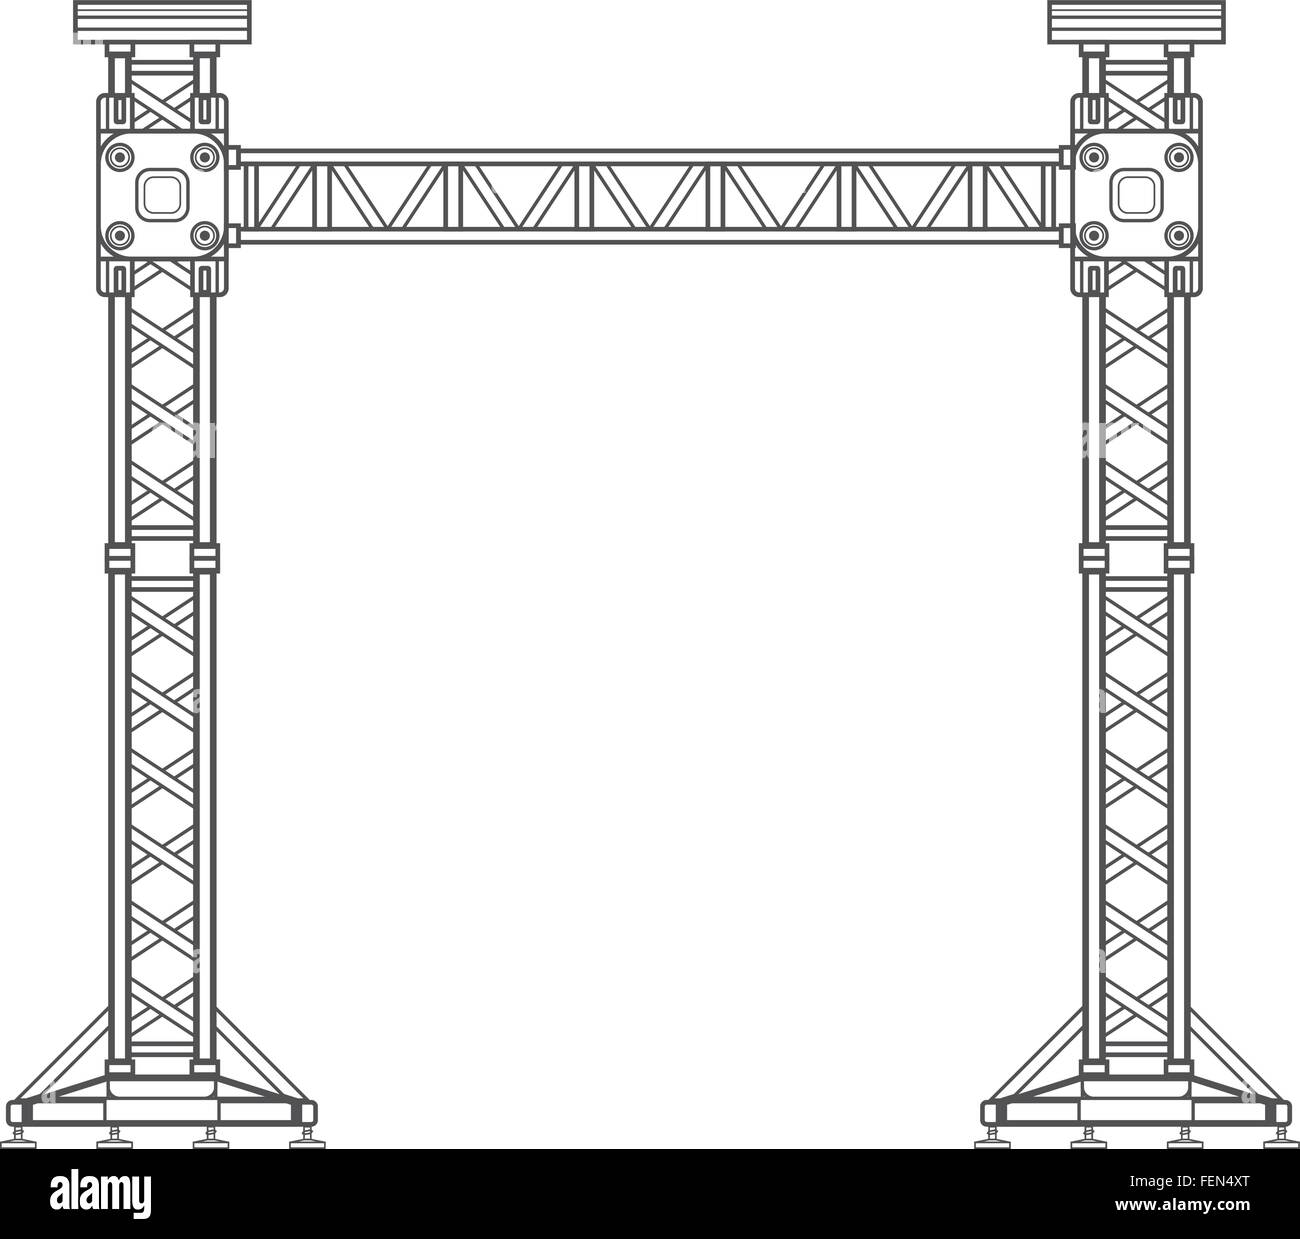 vector dark grey outline stage sound lighting aluminum truss